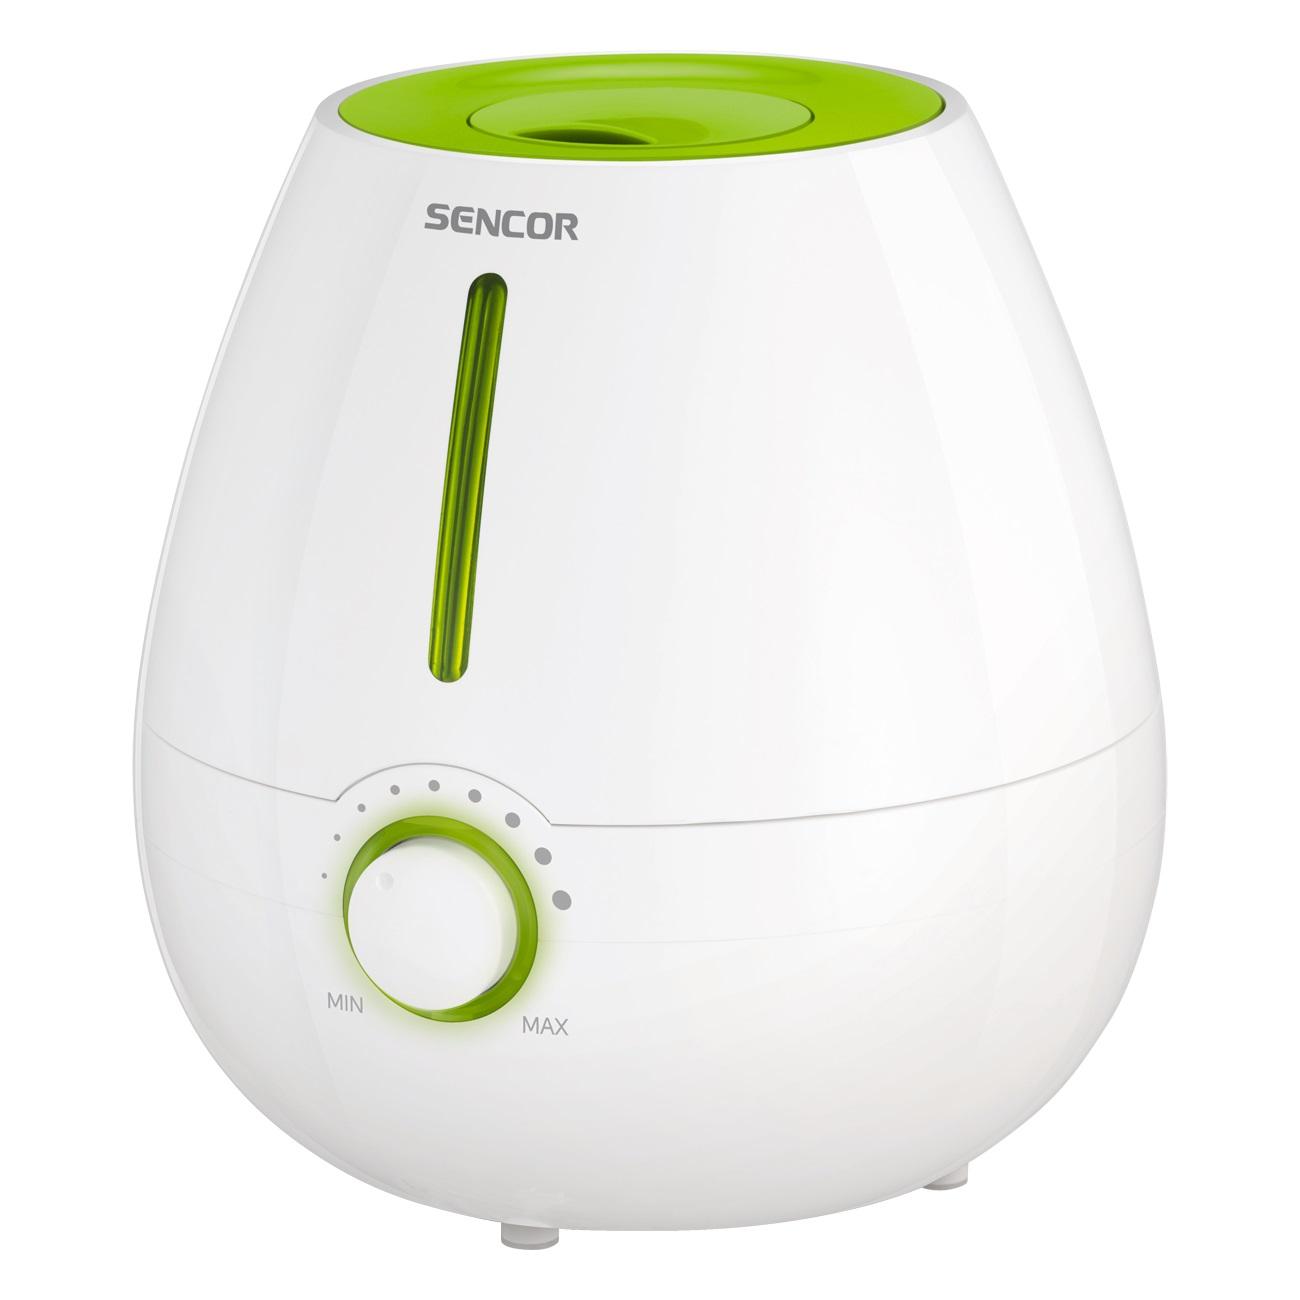 Ilmankostutin Sencor vihreä SHF2001GR-0